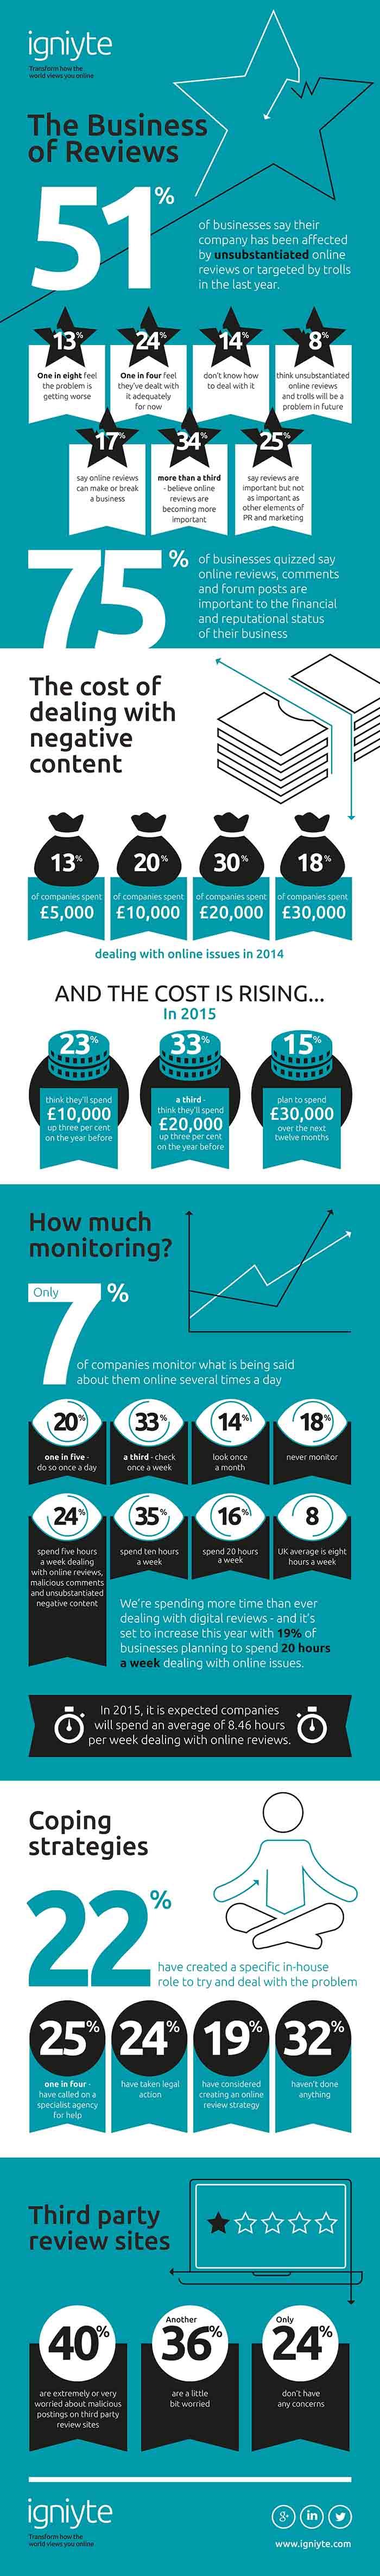 Igniyte Info Graphic - March 2015-V2 copy